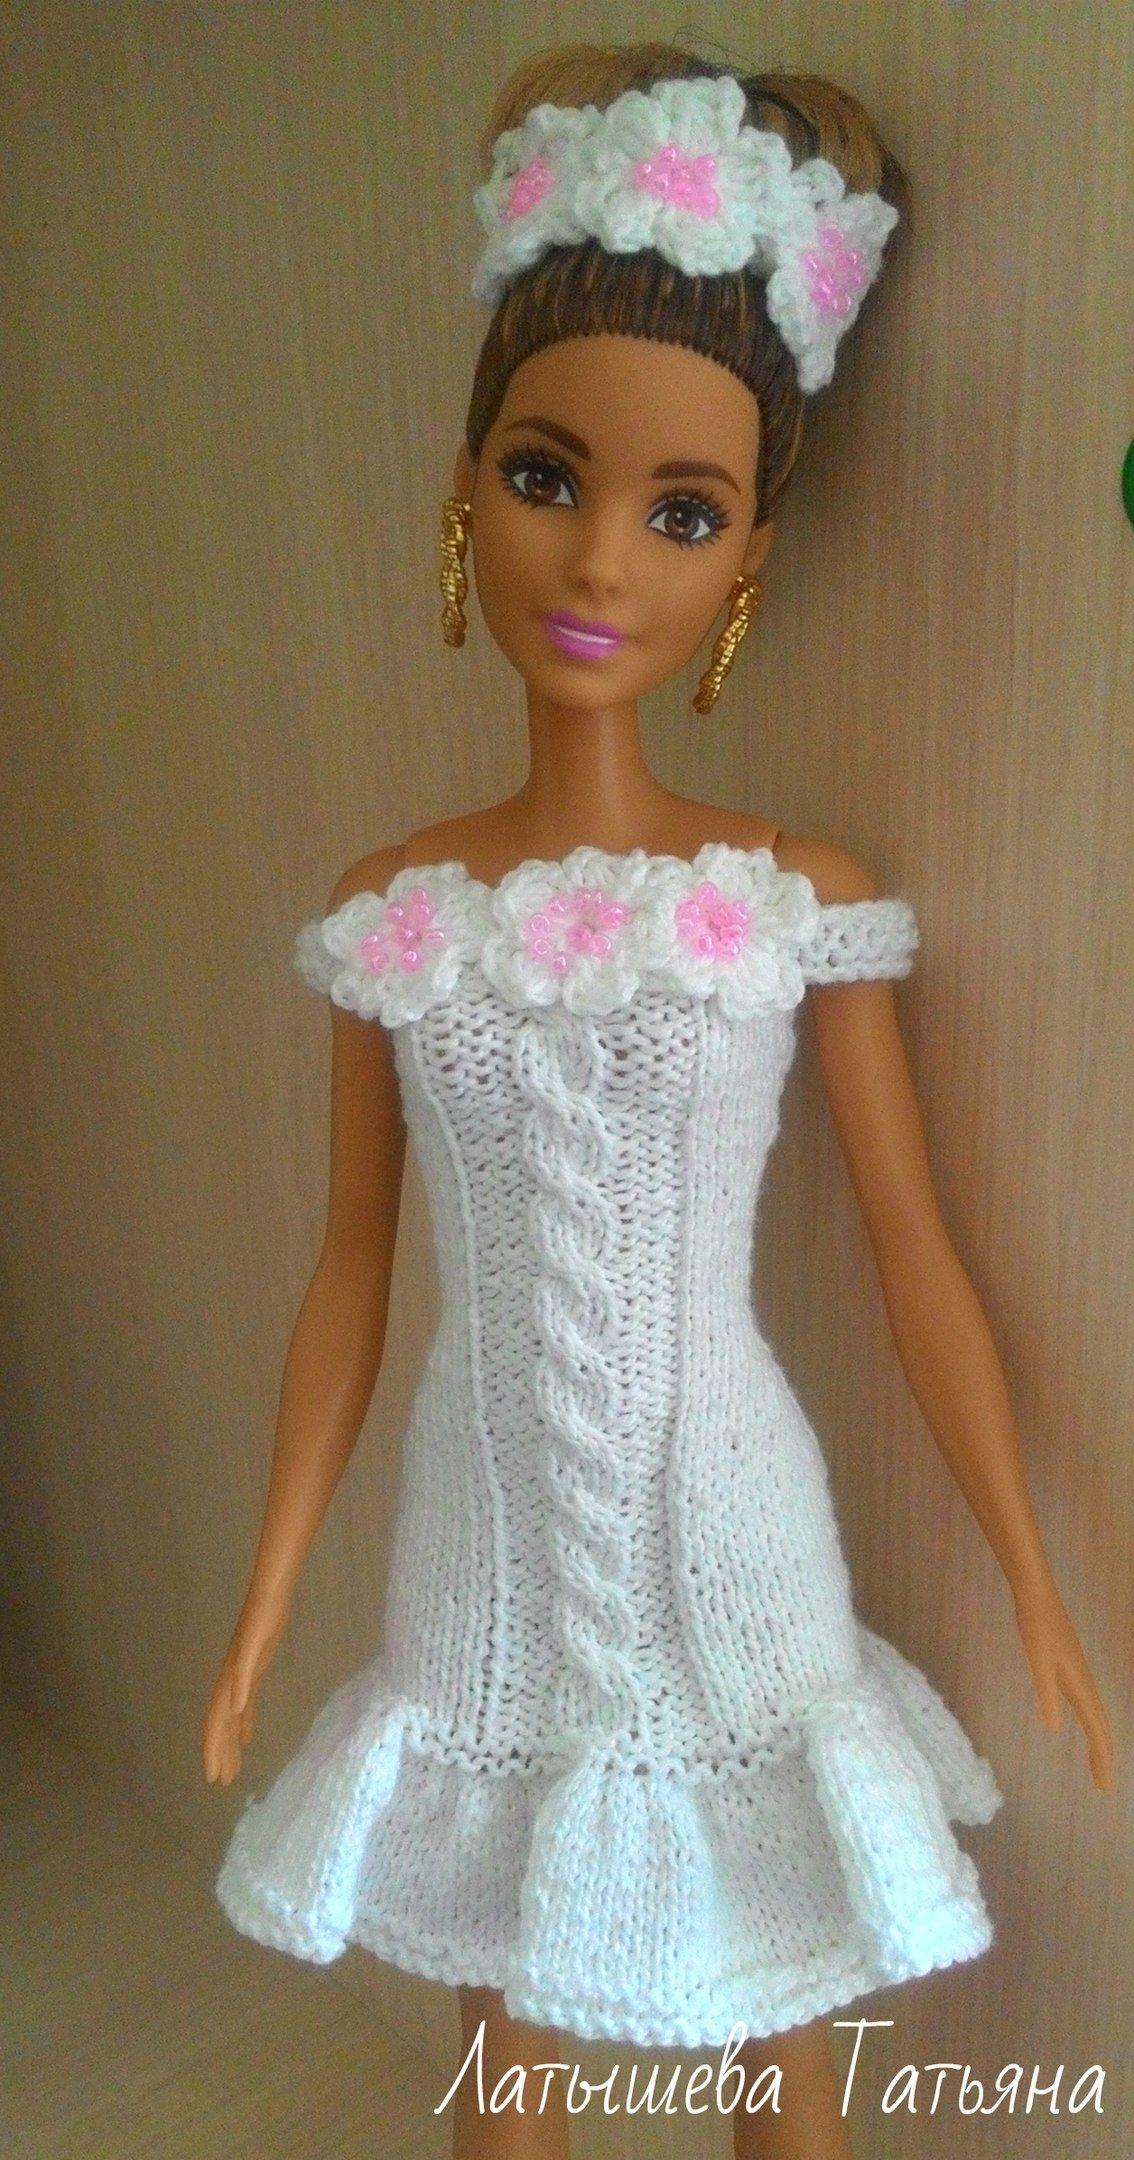 Вязание для Барби. - 71 photos | VK | Modèles tricot ...